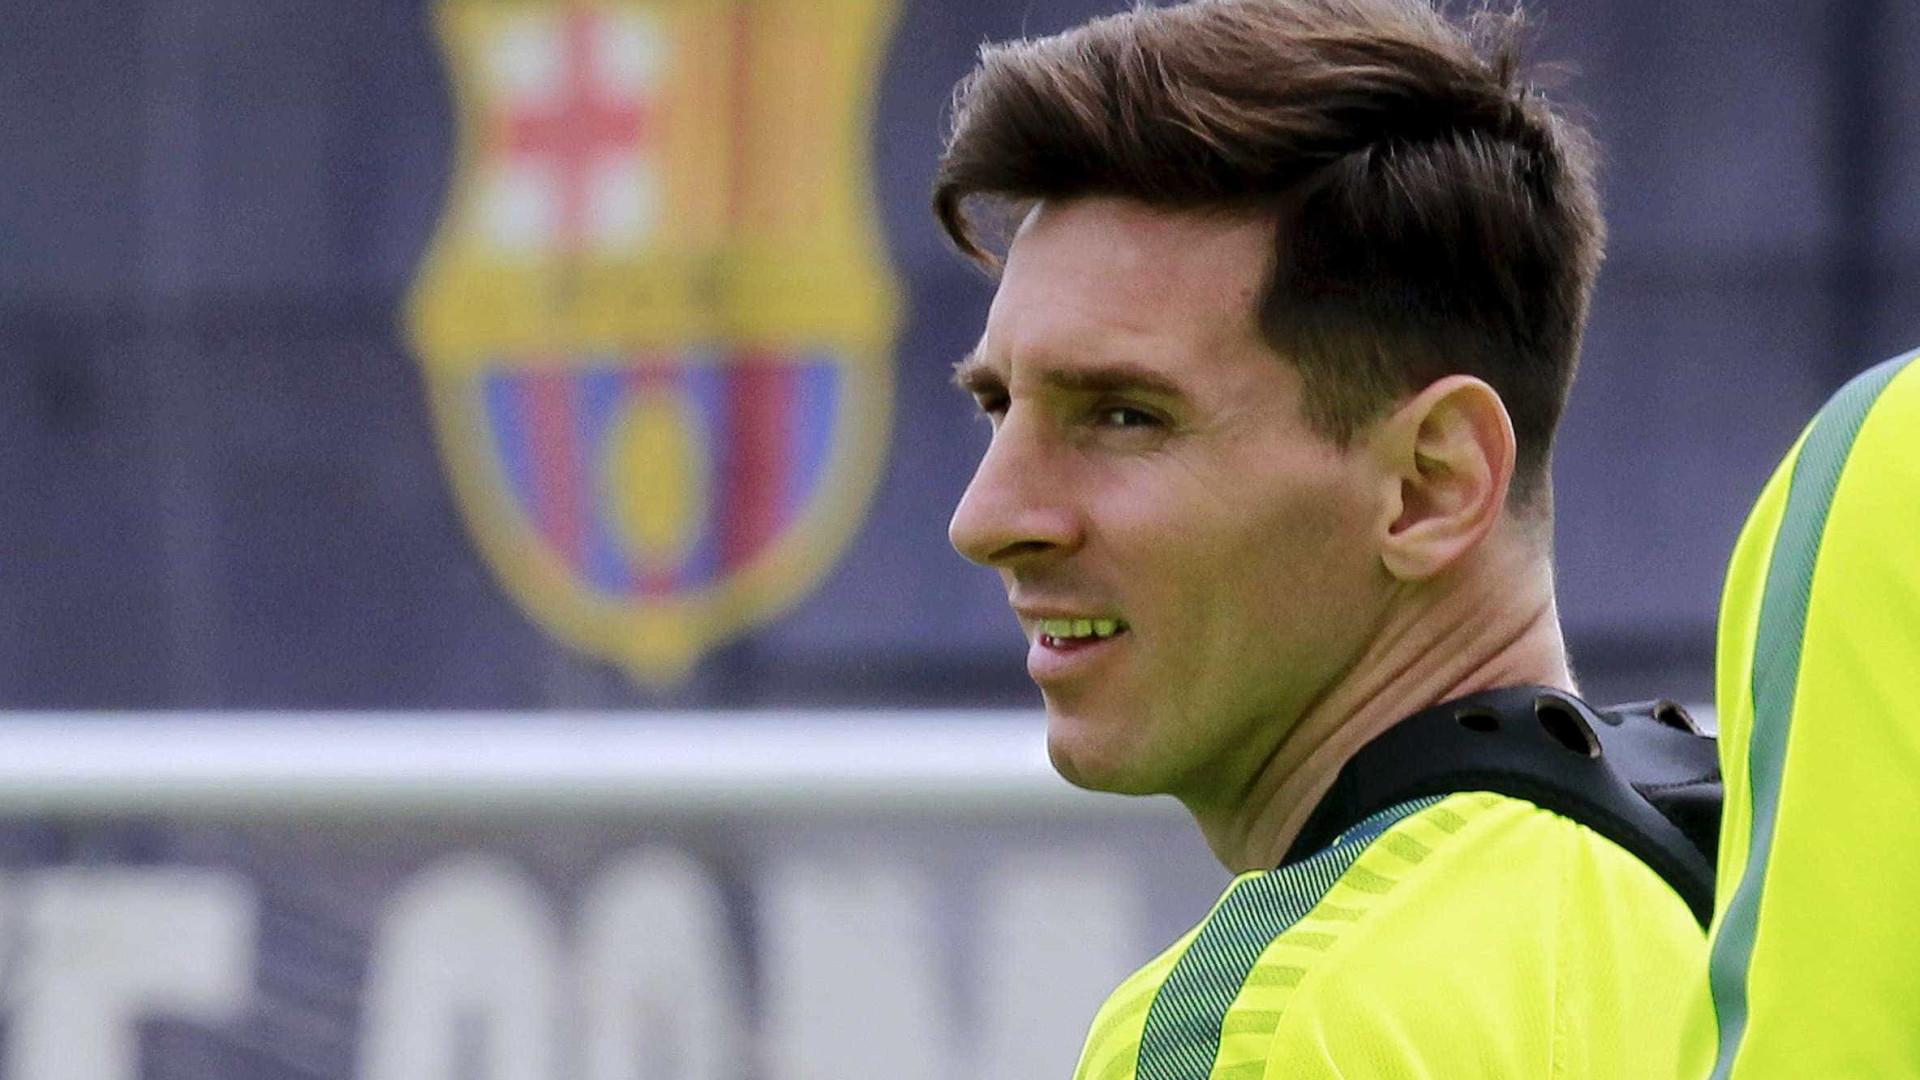 Messi inspira-se na Sagrada Família para nova tatuagem